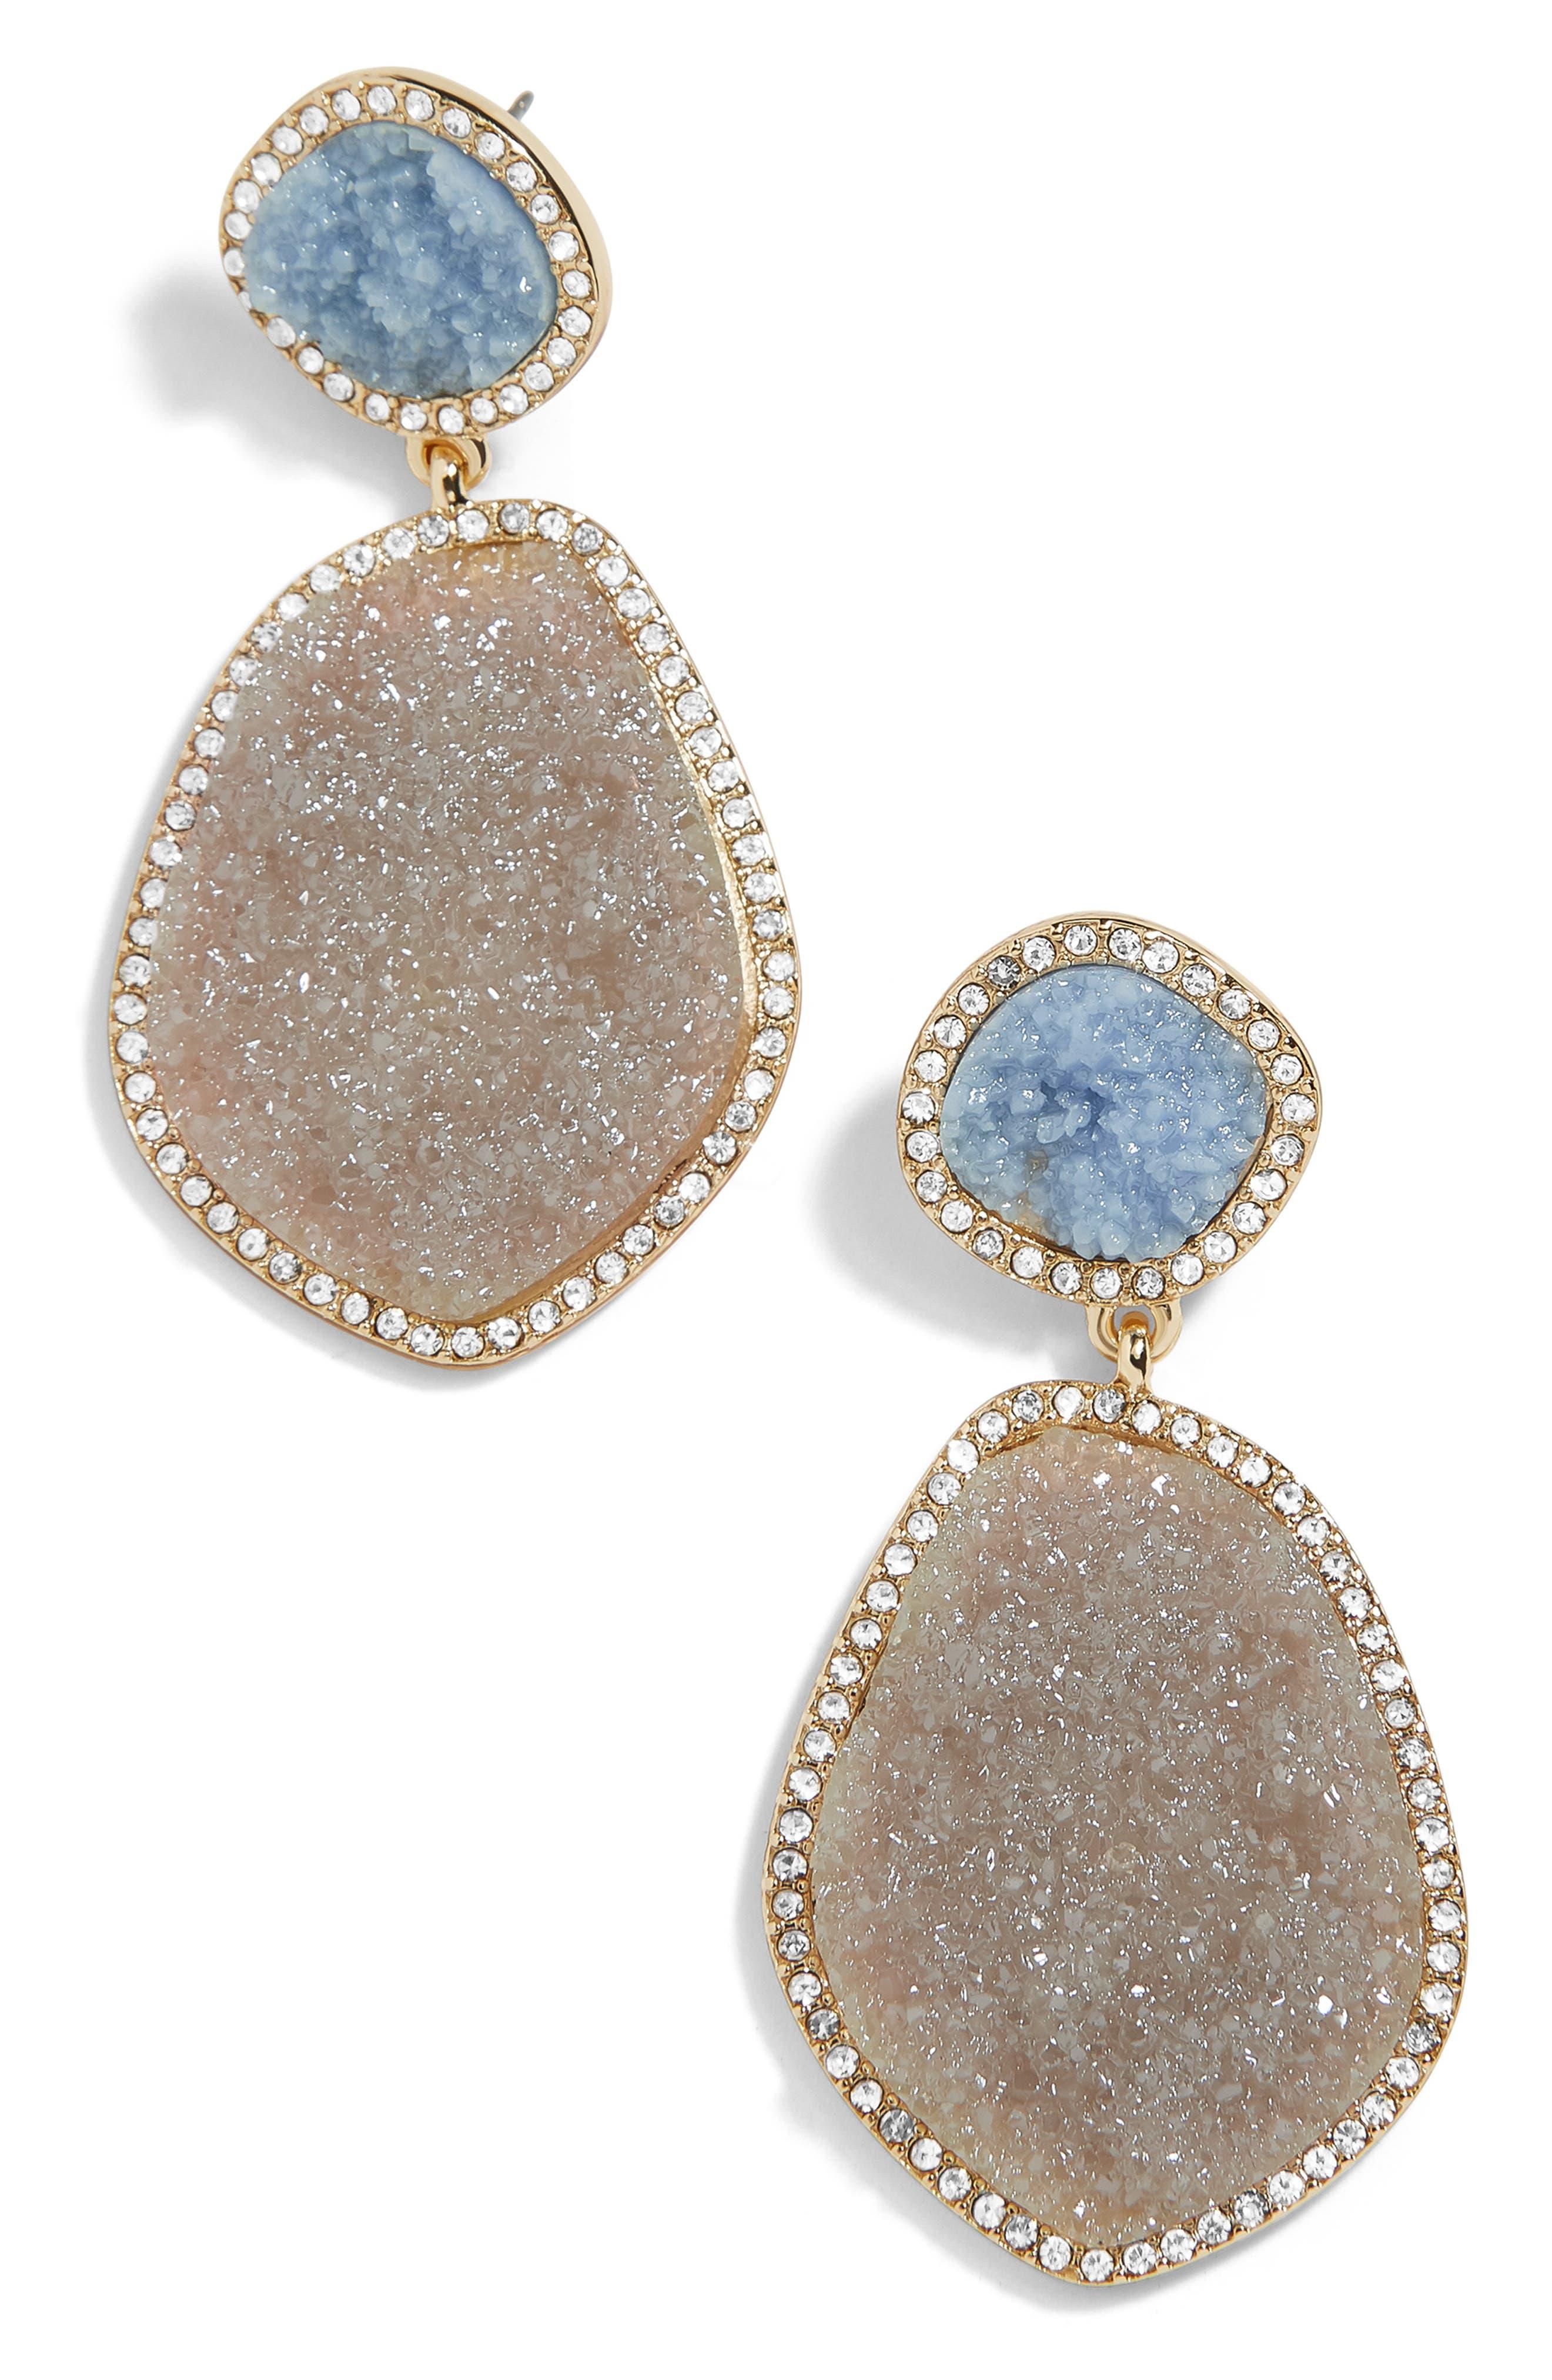 Vina Drop Earrings,                         Main,                         color, GREY